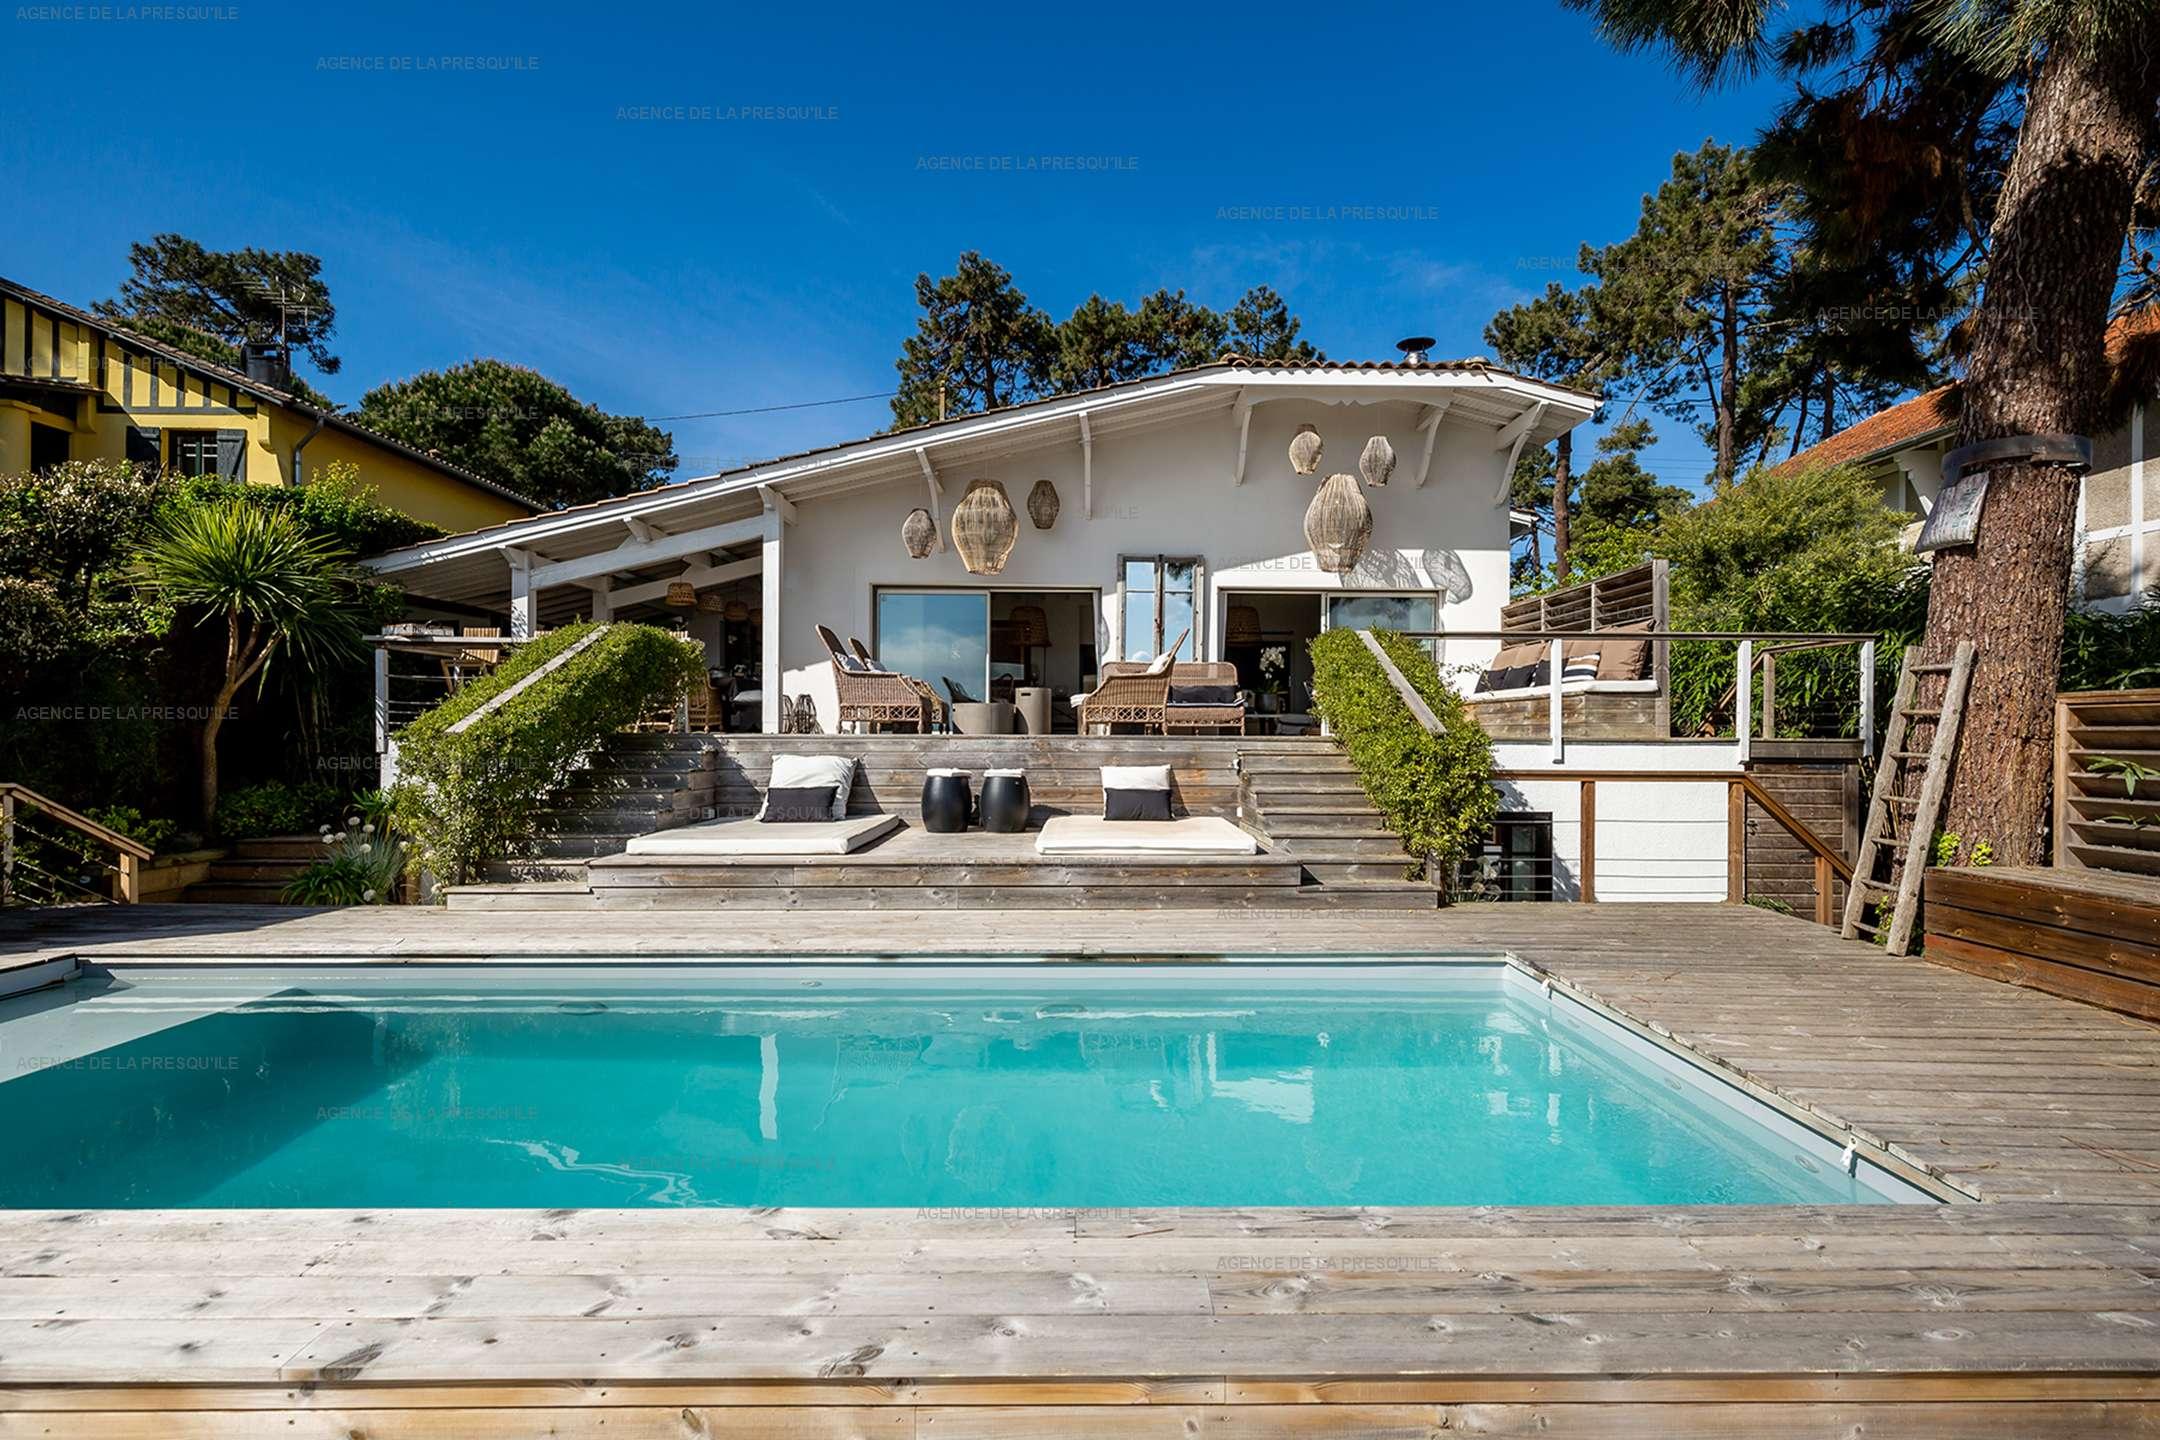 Location: Superbe villa avec vue bassin et piscine 2